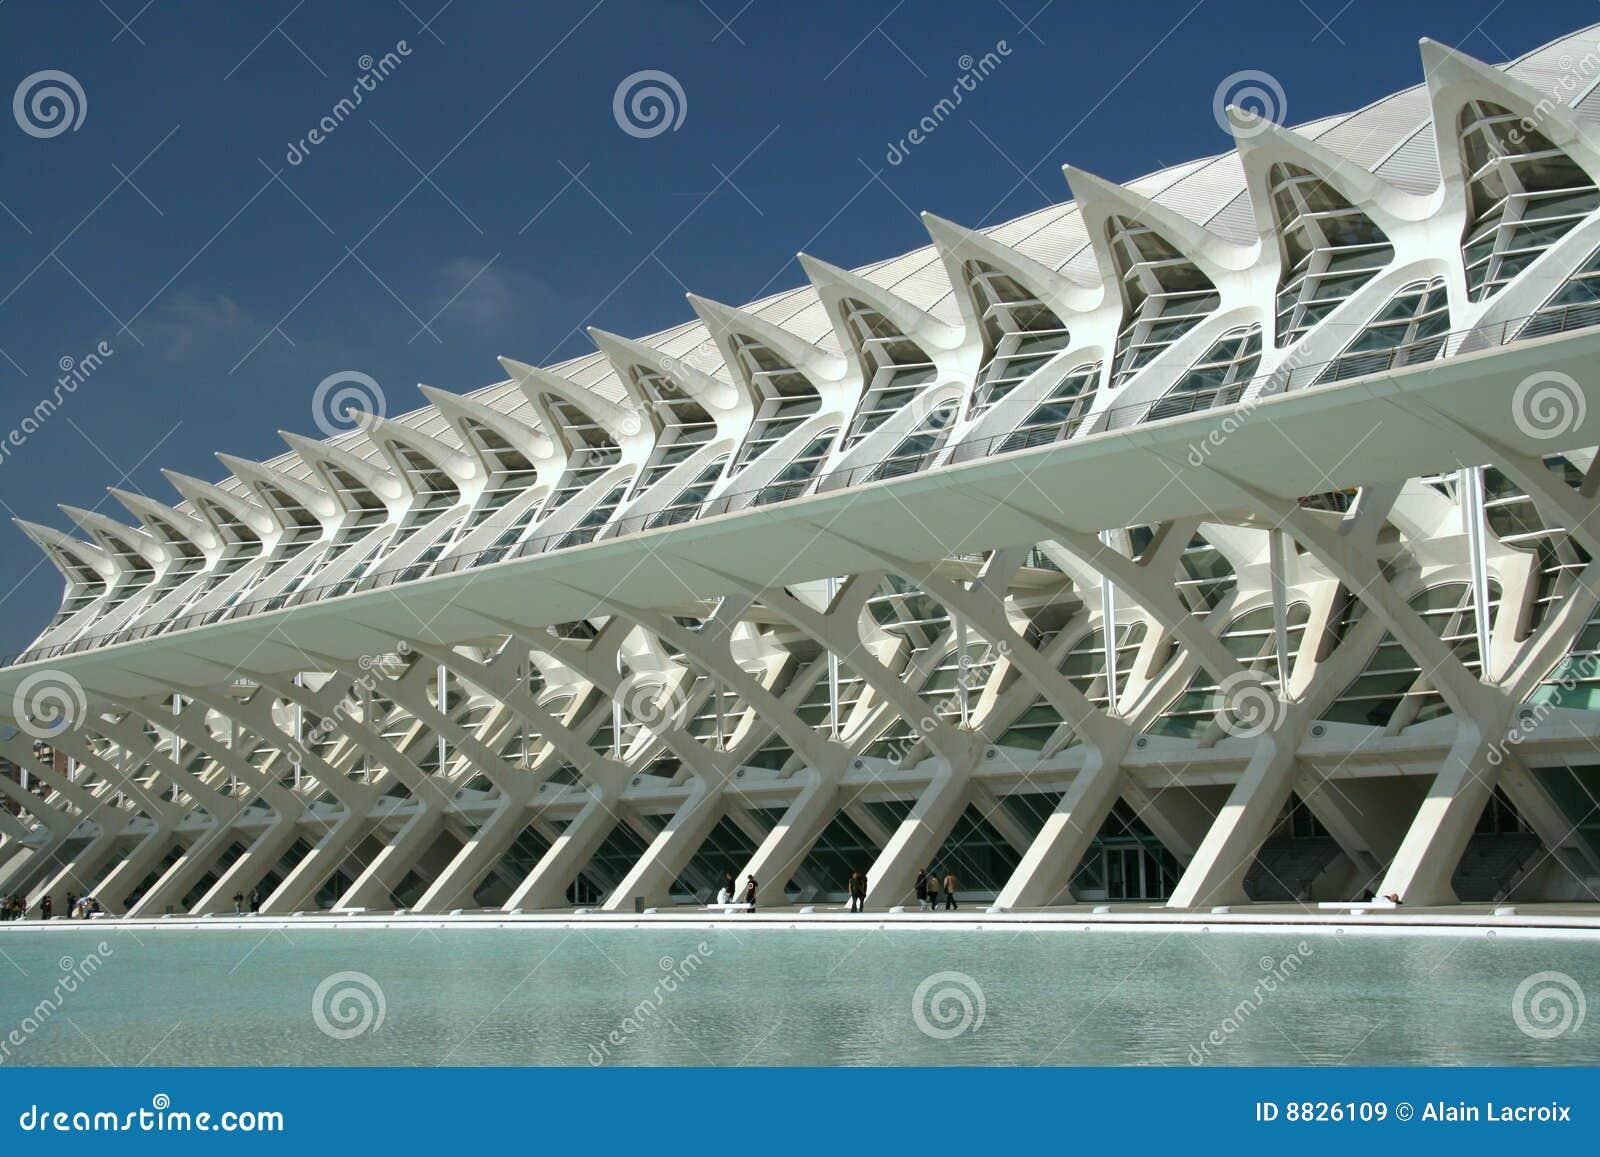 Futuristic Architecture Editorial Stock Image - Image: 8826109